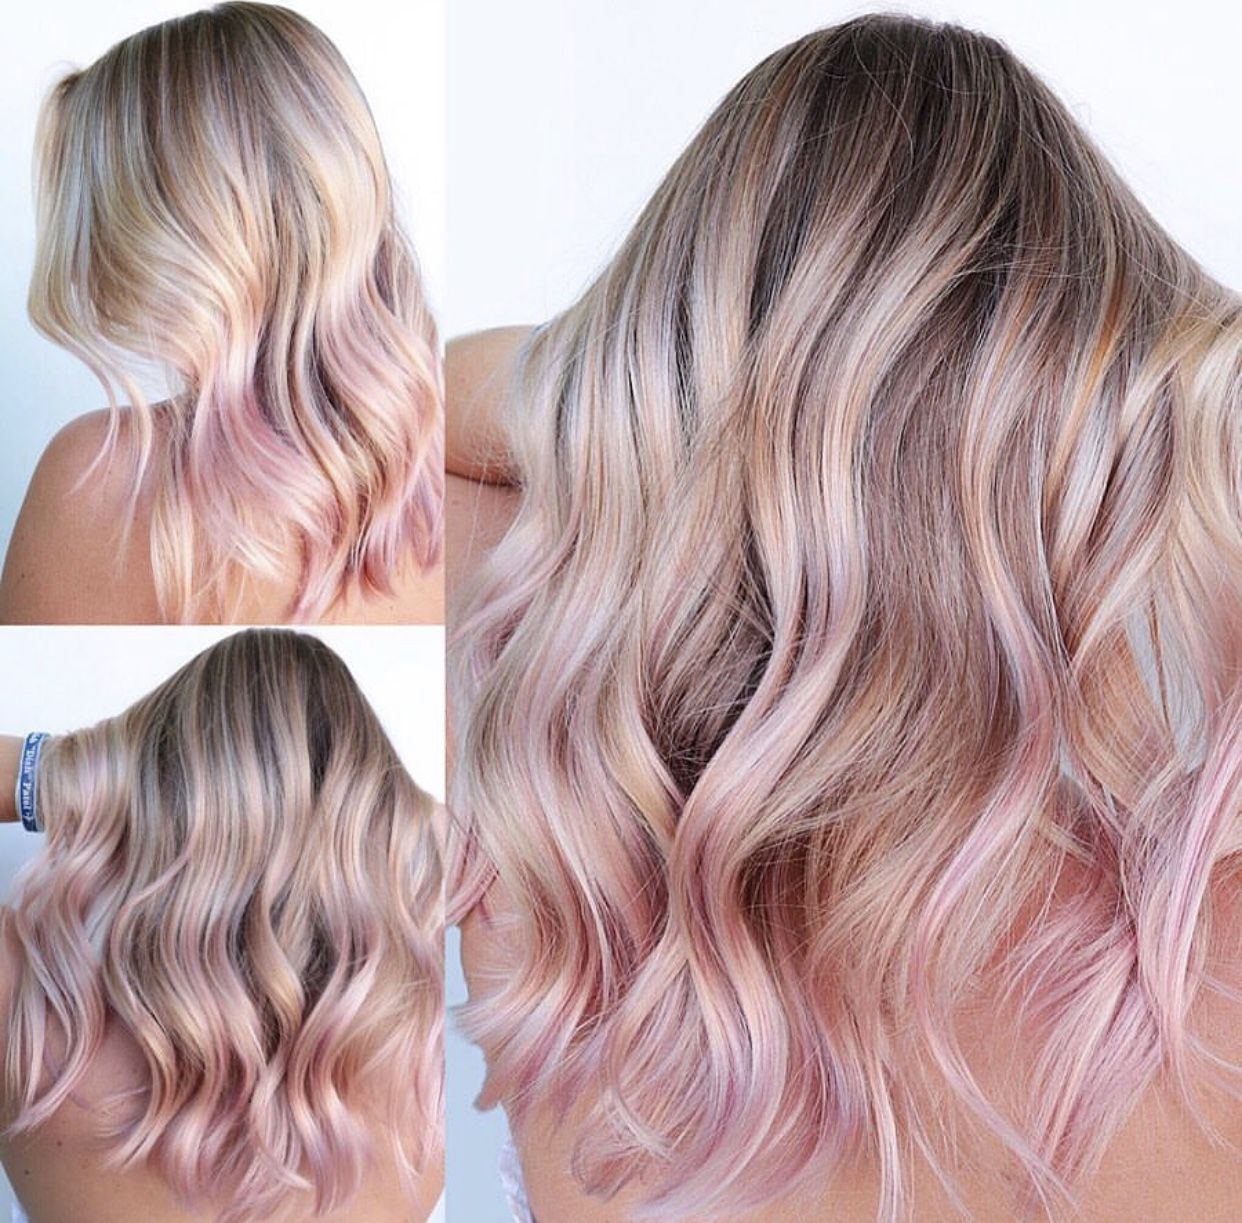 Cool Blonde Hair With Pastel Pink Rose Gold Hair Tips Hair Hacks